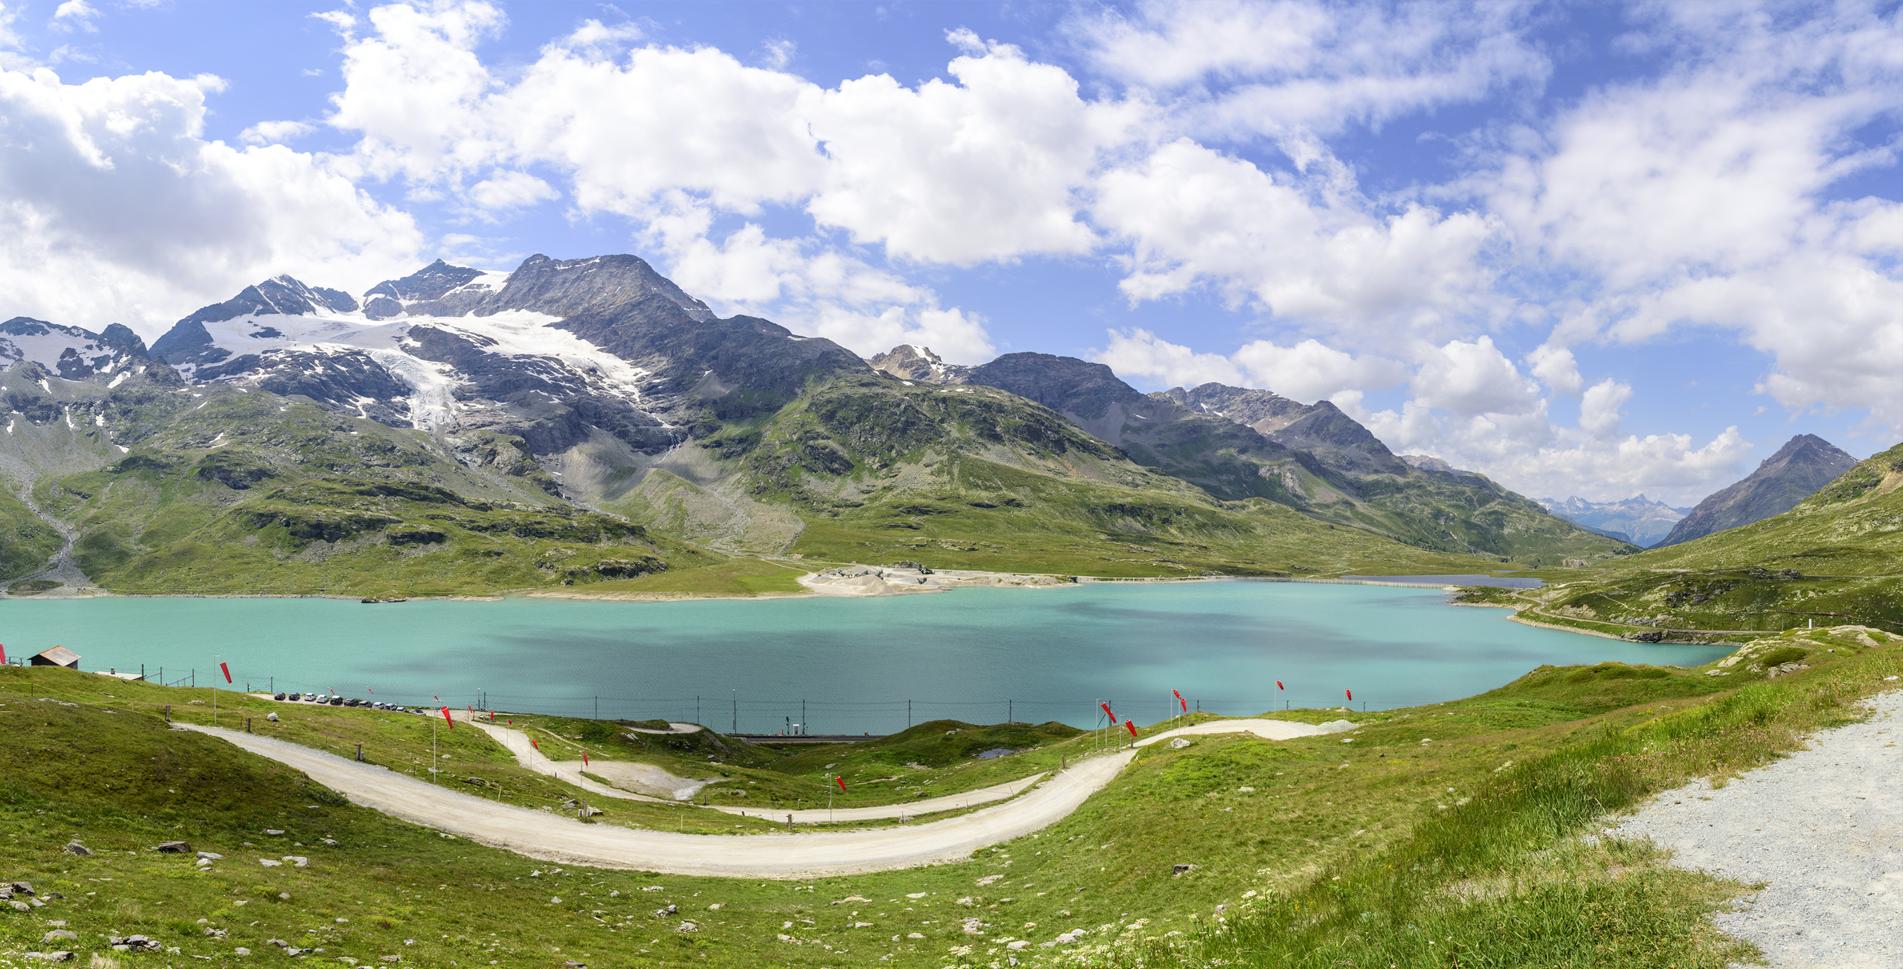 Wanderung vom Berninapass / Ospizio Bernina mit dem Lago Bianco via Sassal Masone, Alp Grüm, Lagh da Palü, Cavaglia, Cadera nach Poschiavo im Val Poschiavo